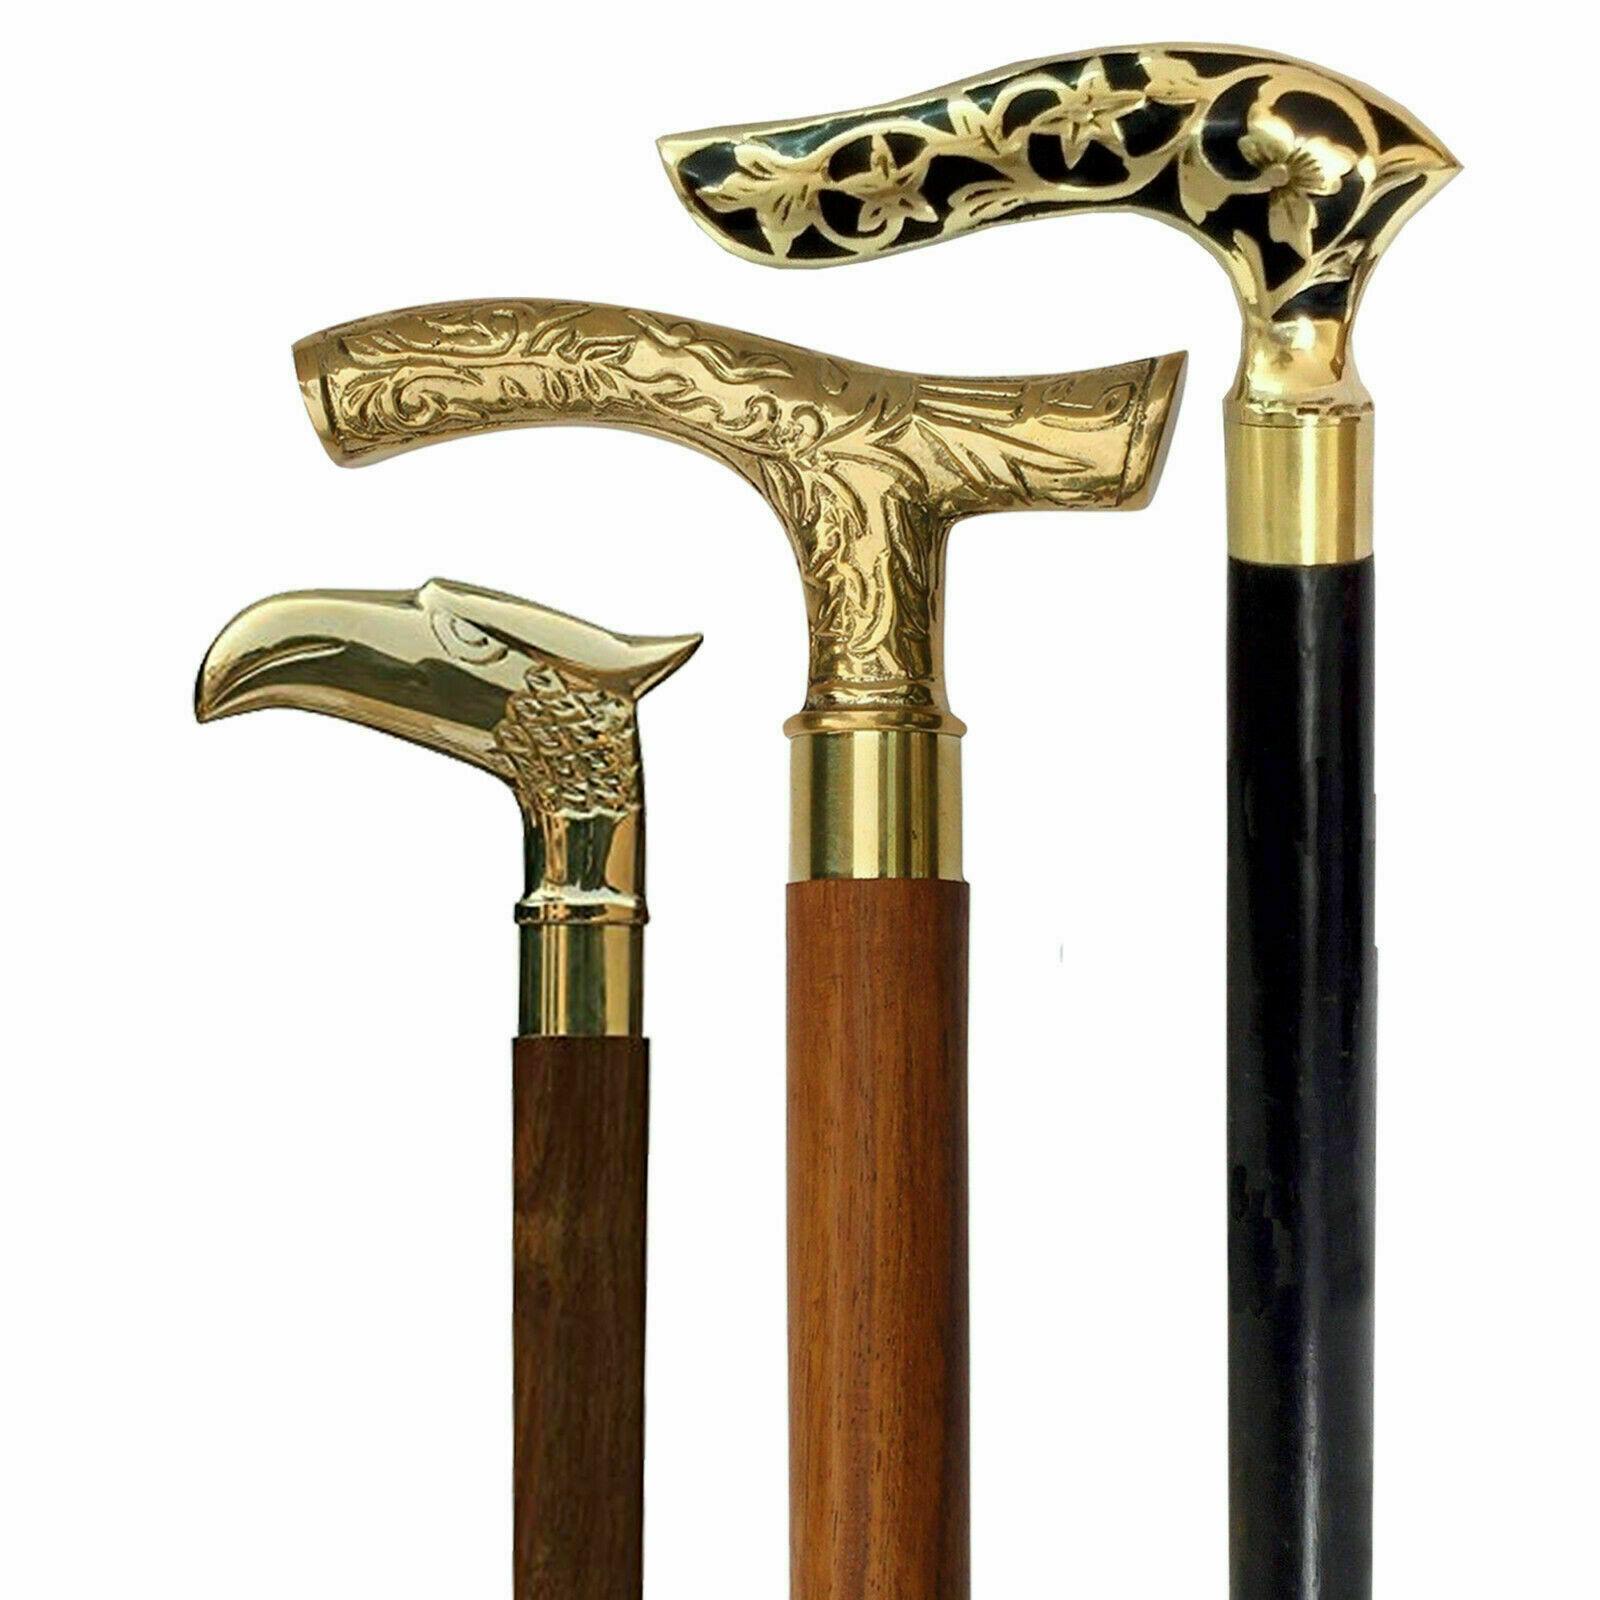 Vintage Antique Walking Cane Wooden Walking Stick SET OF 3Brass Handle Knob Gift